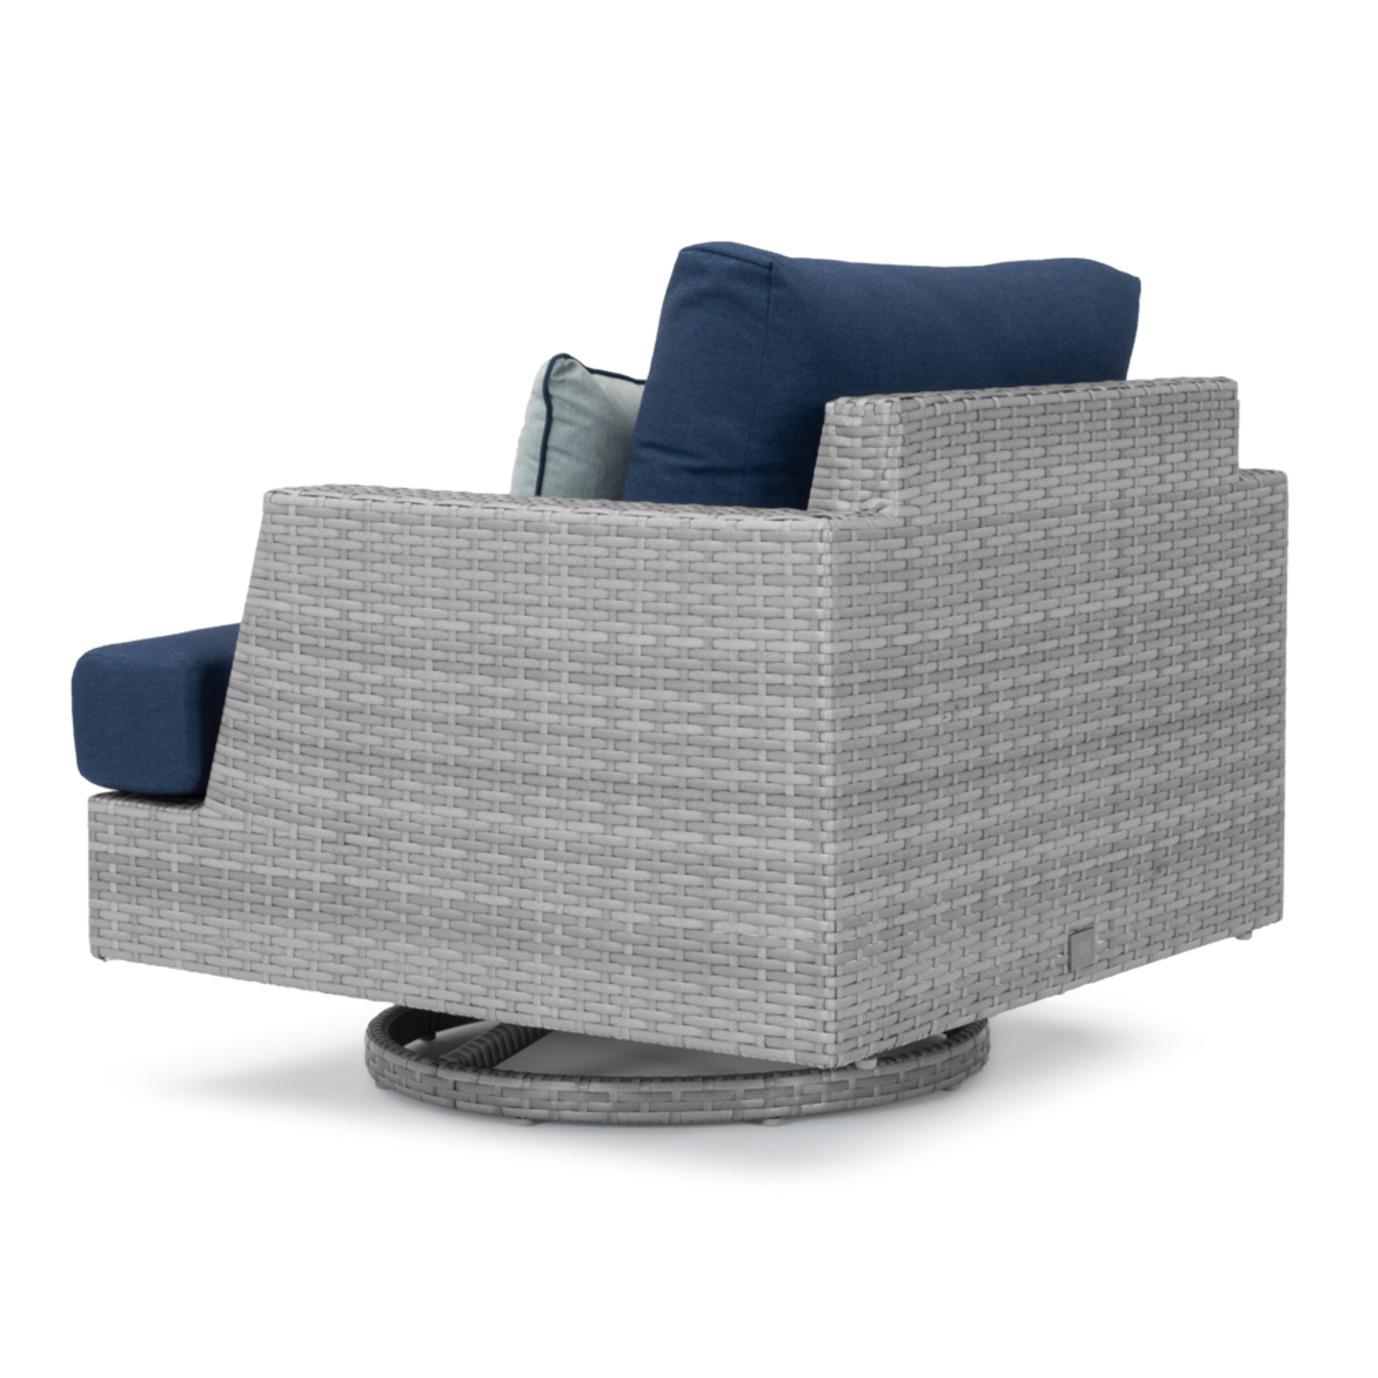 Portofino® Comfort 5 Piece Motion Wood Seating Set - Laguna Blue